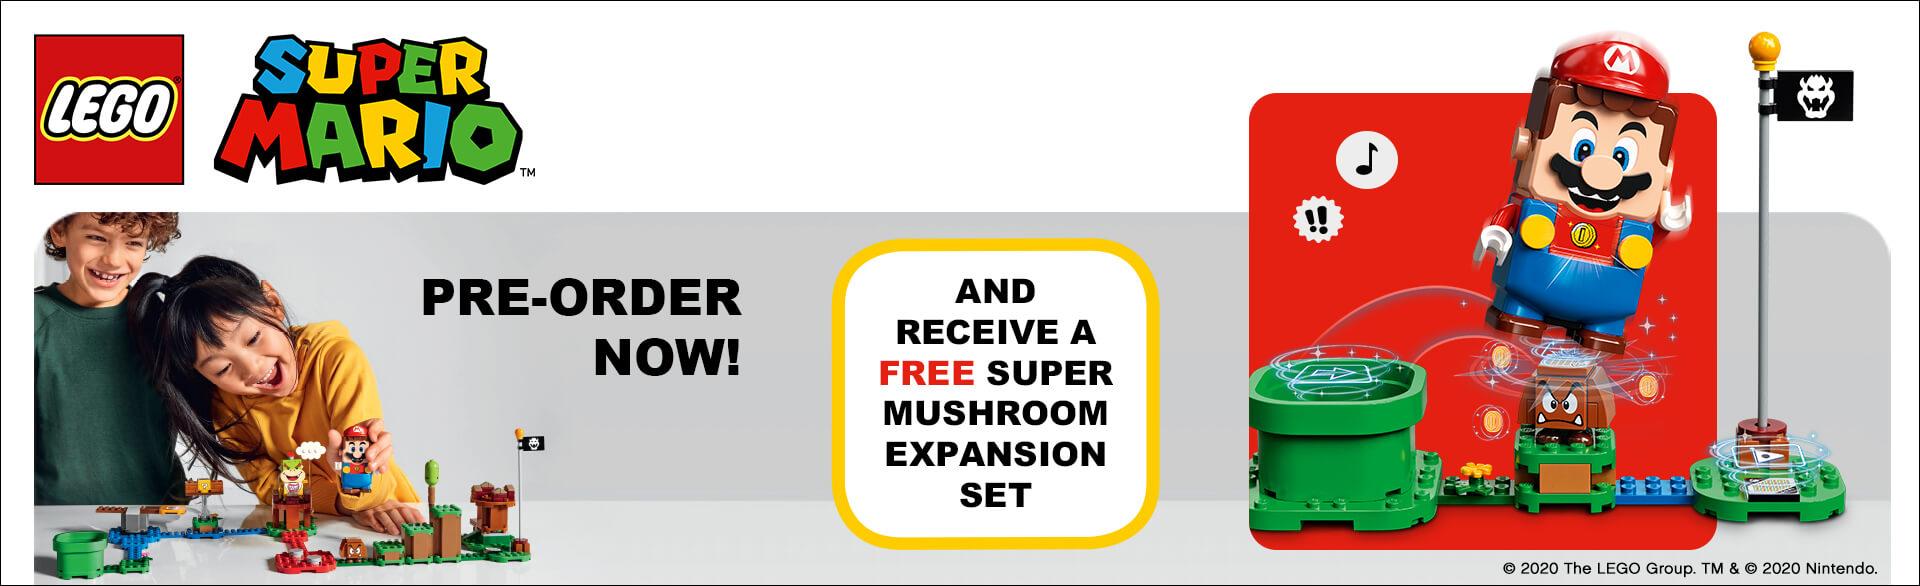 LEGO x Super Mario Pre - Order